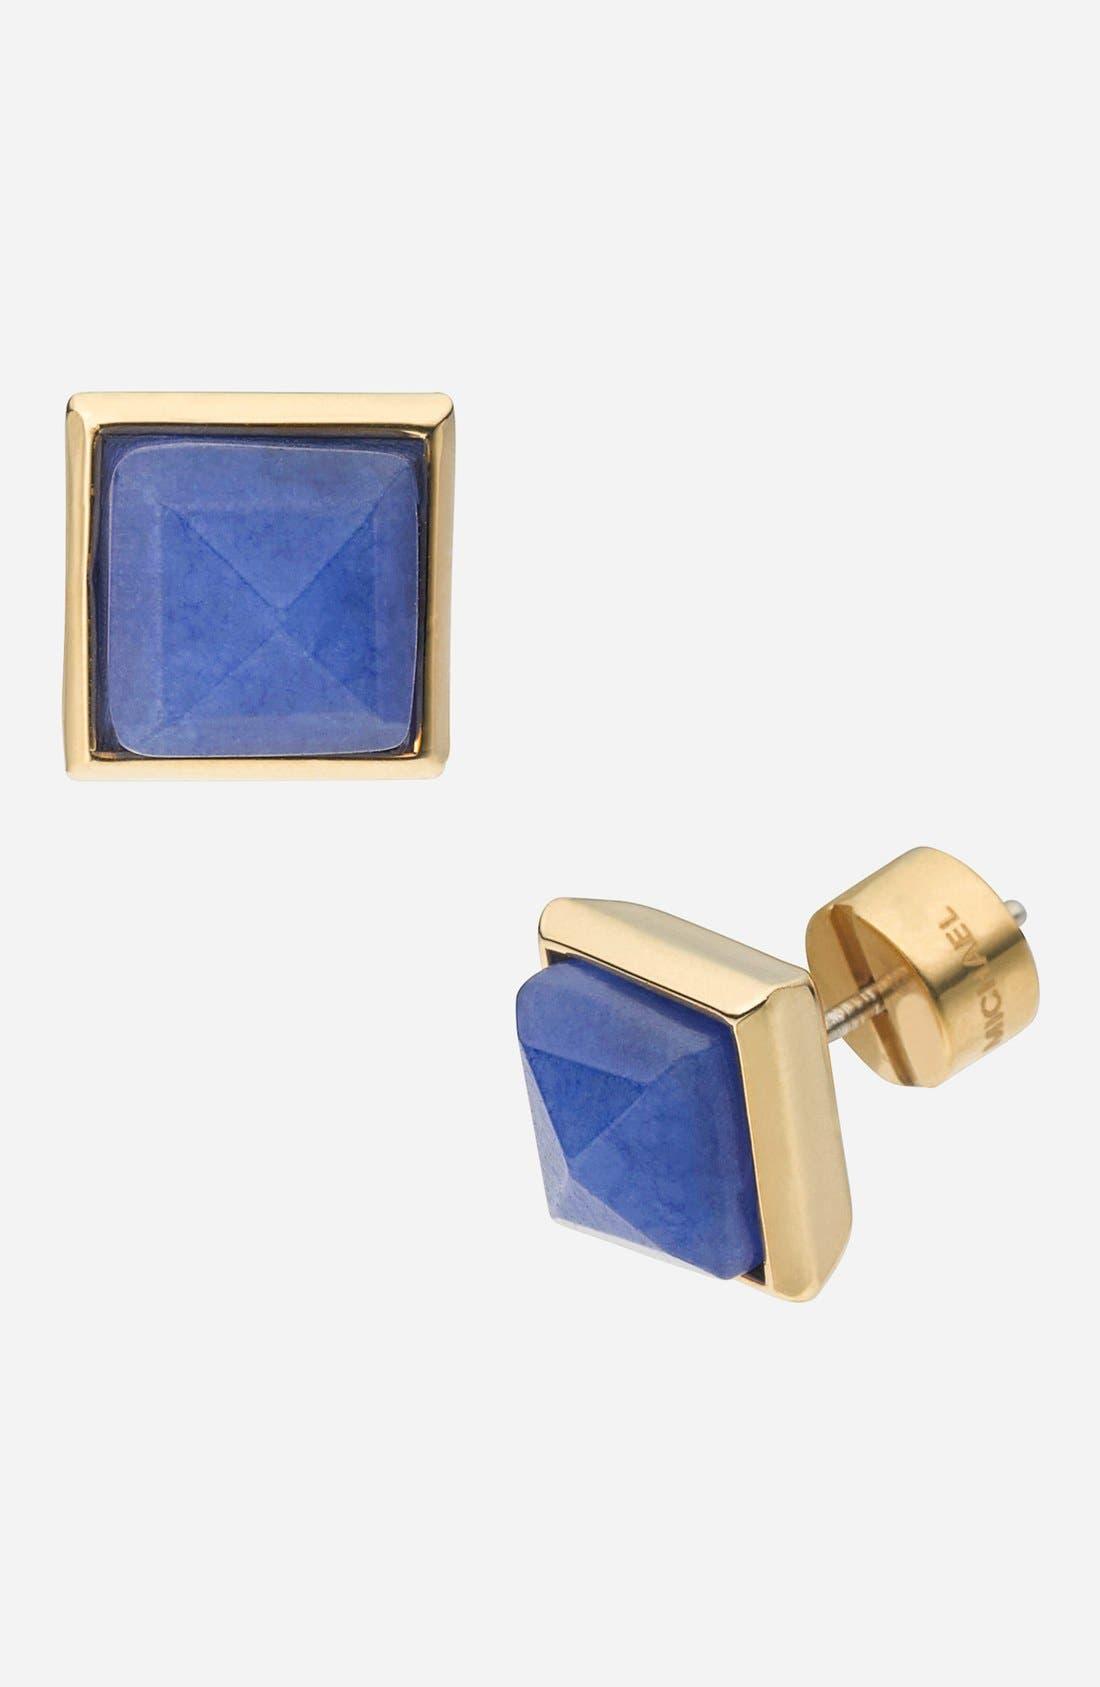 Alternate Image 1 Selected - Michael Kors 'Glam Rock' Stone Pyramid Stud Earrings